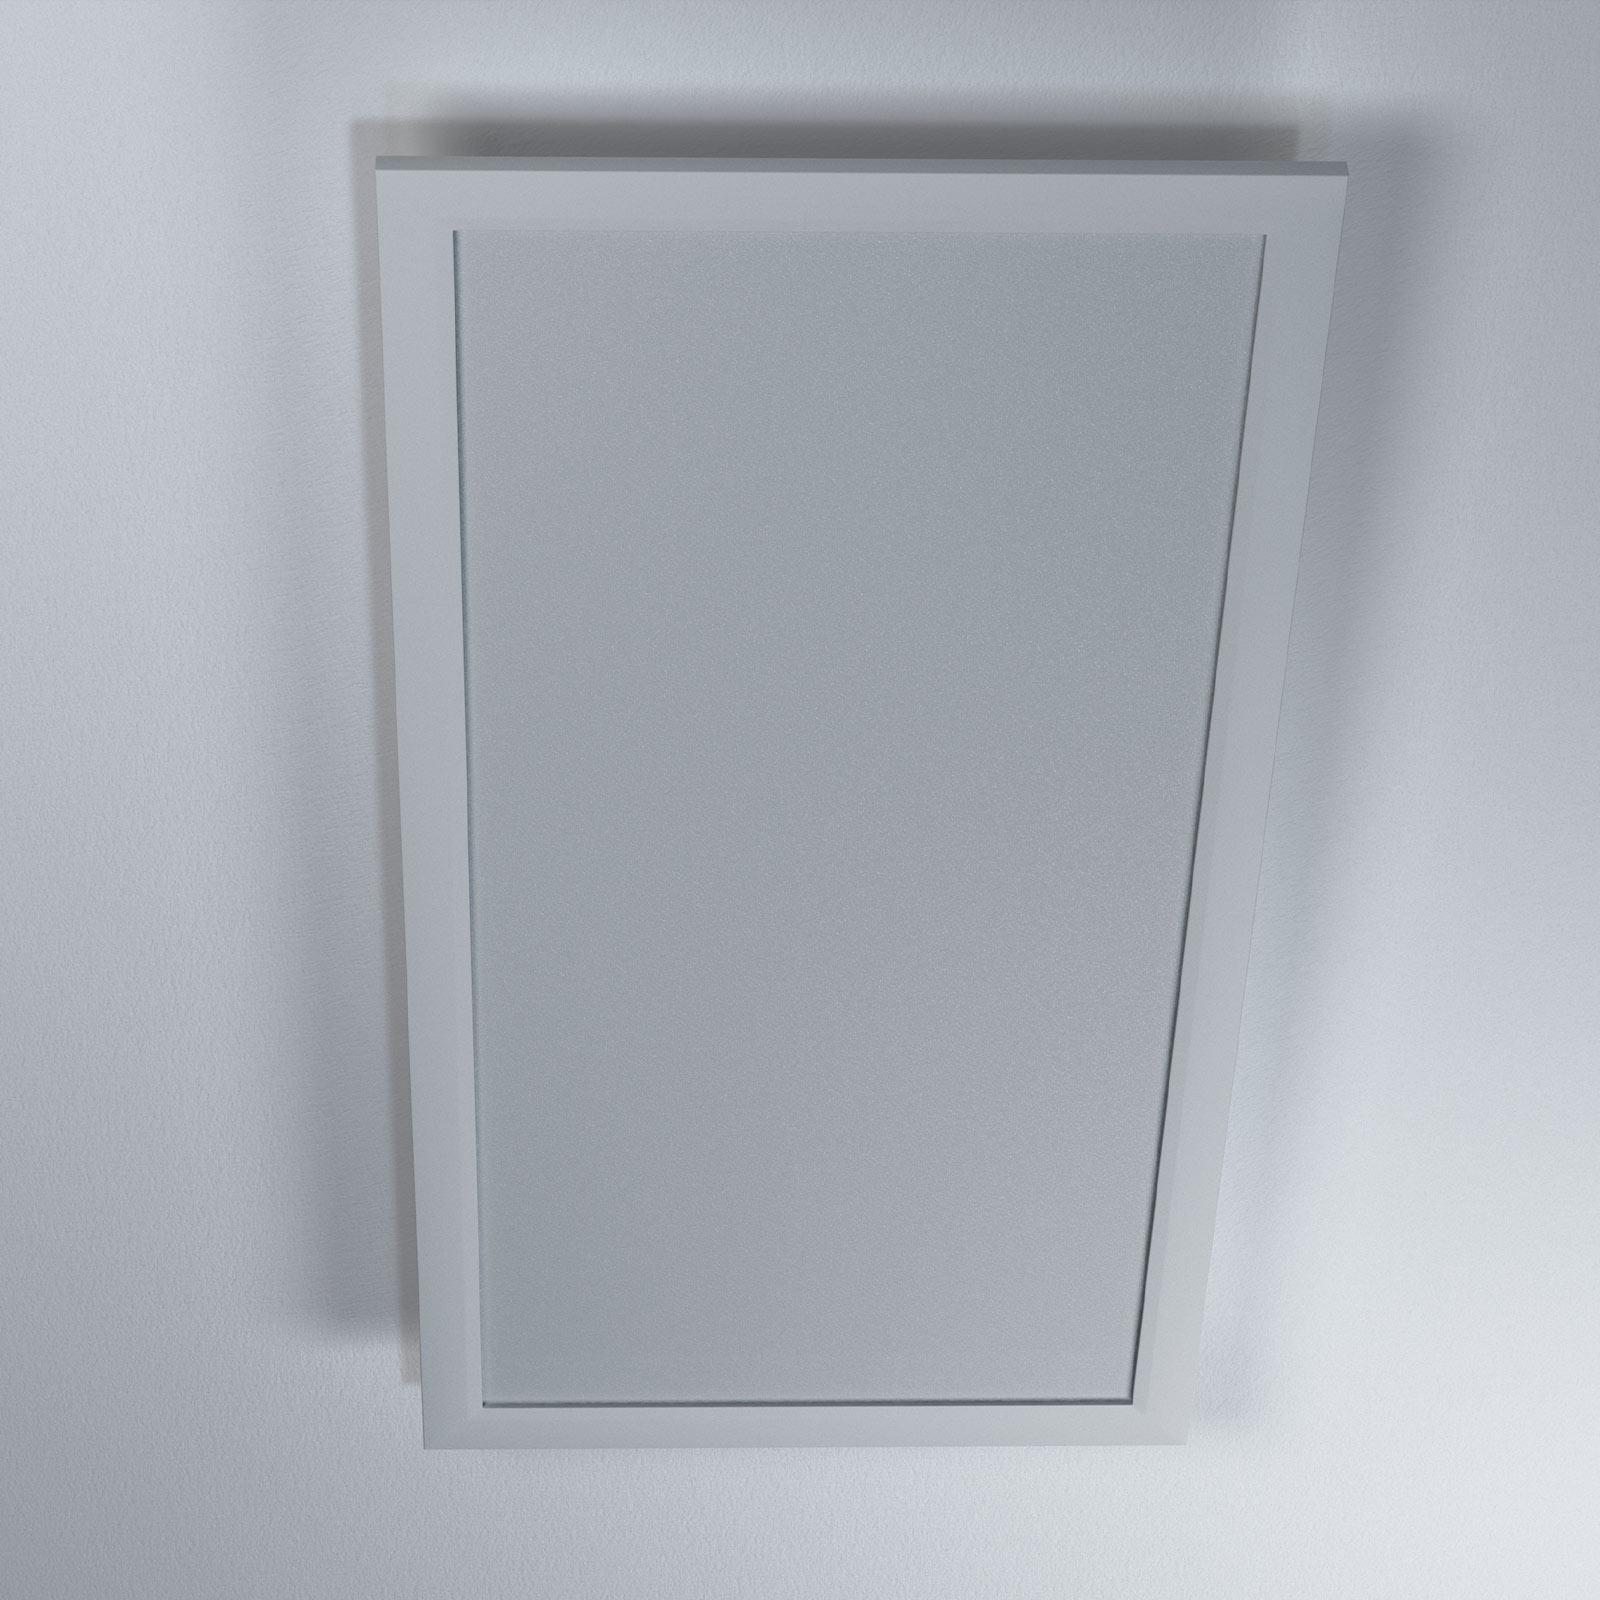 LEDVANCE Planon Plus LED-Panel 60x30cm 840 15W